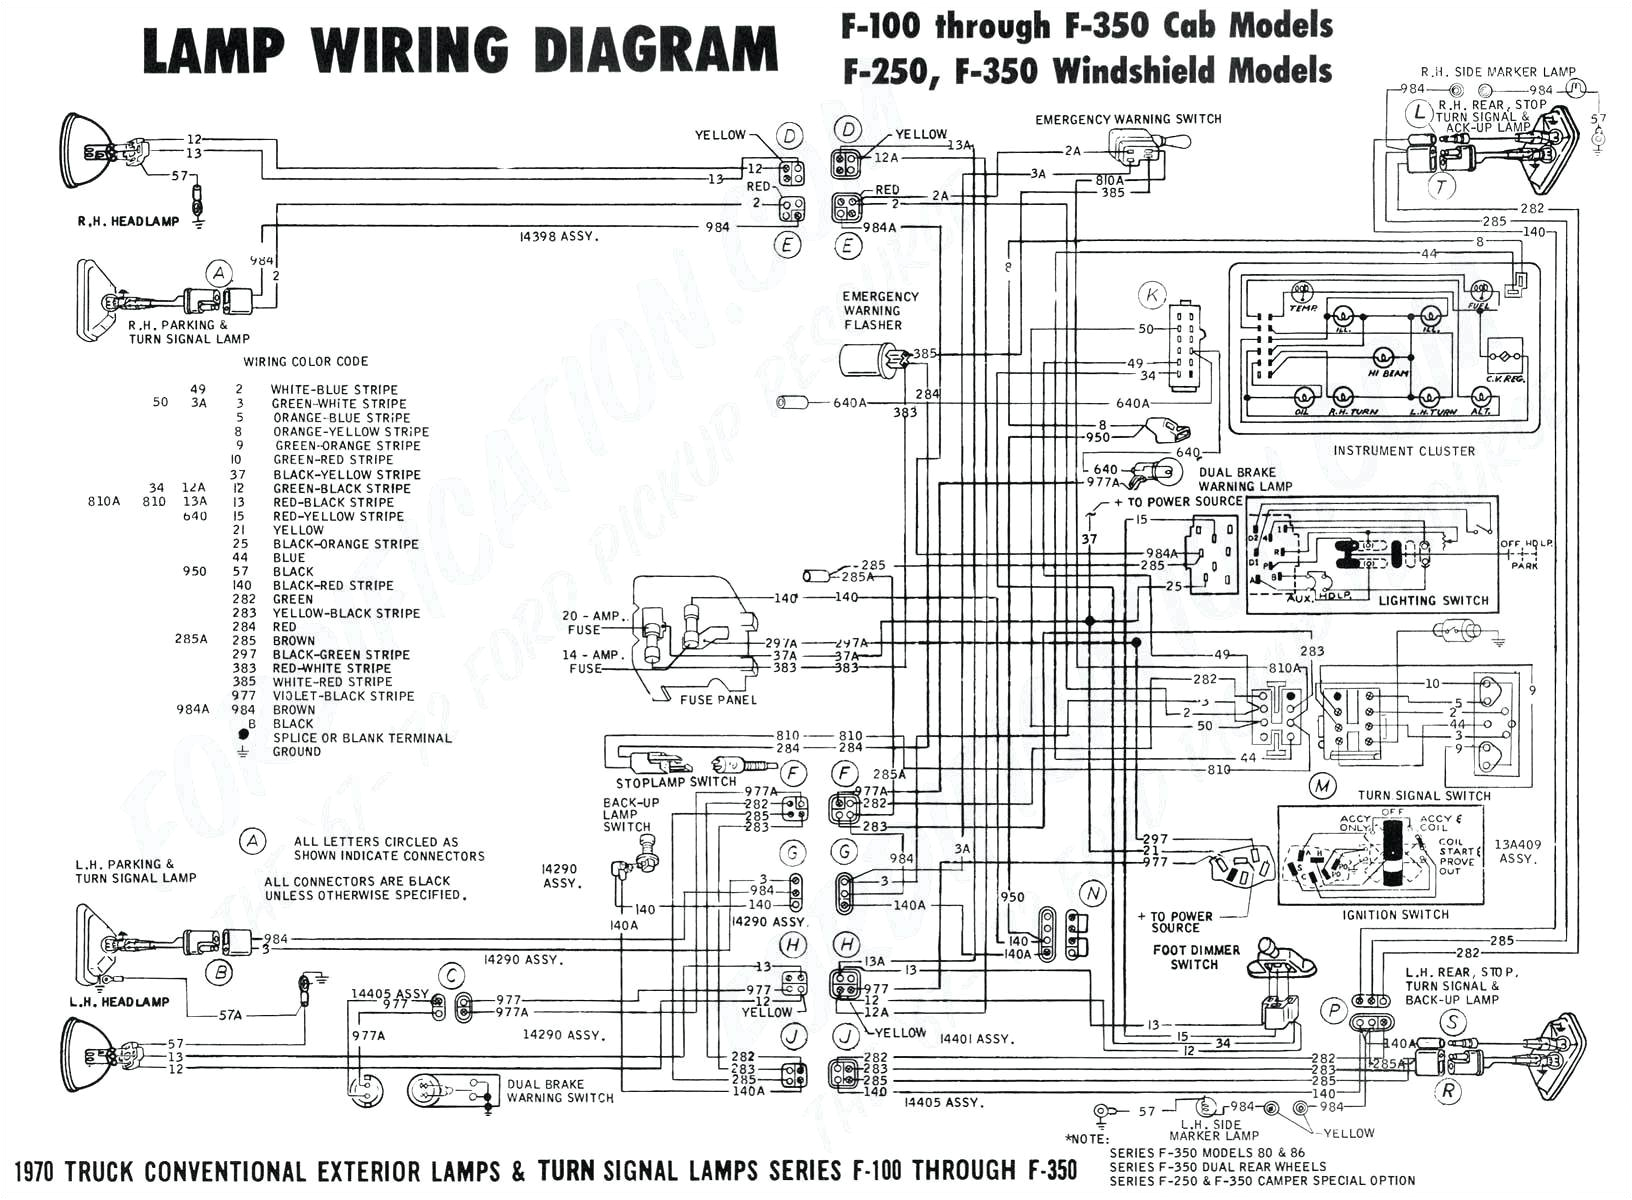 2013 nissan altima fuse diagram wiring diagram centre 2014 nissan sentra fuse box 2013 nissan sentra fuse box